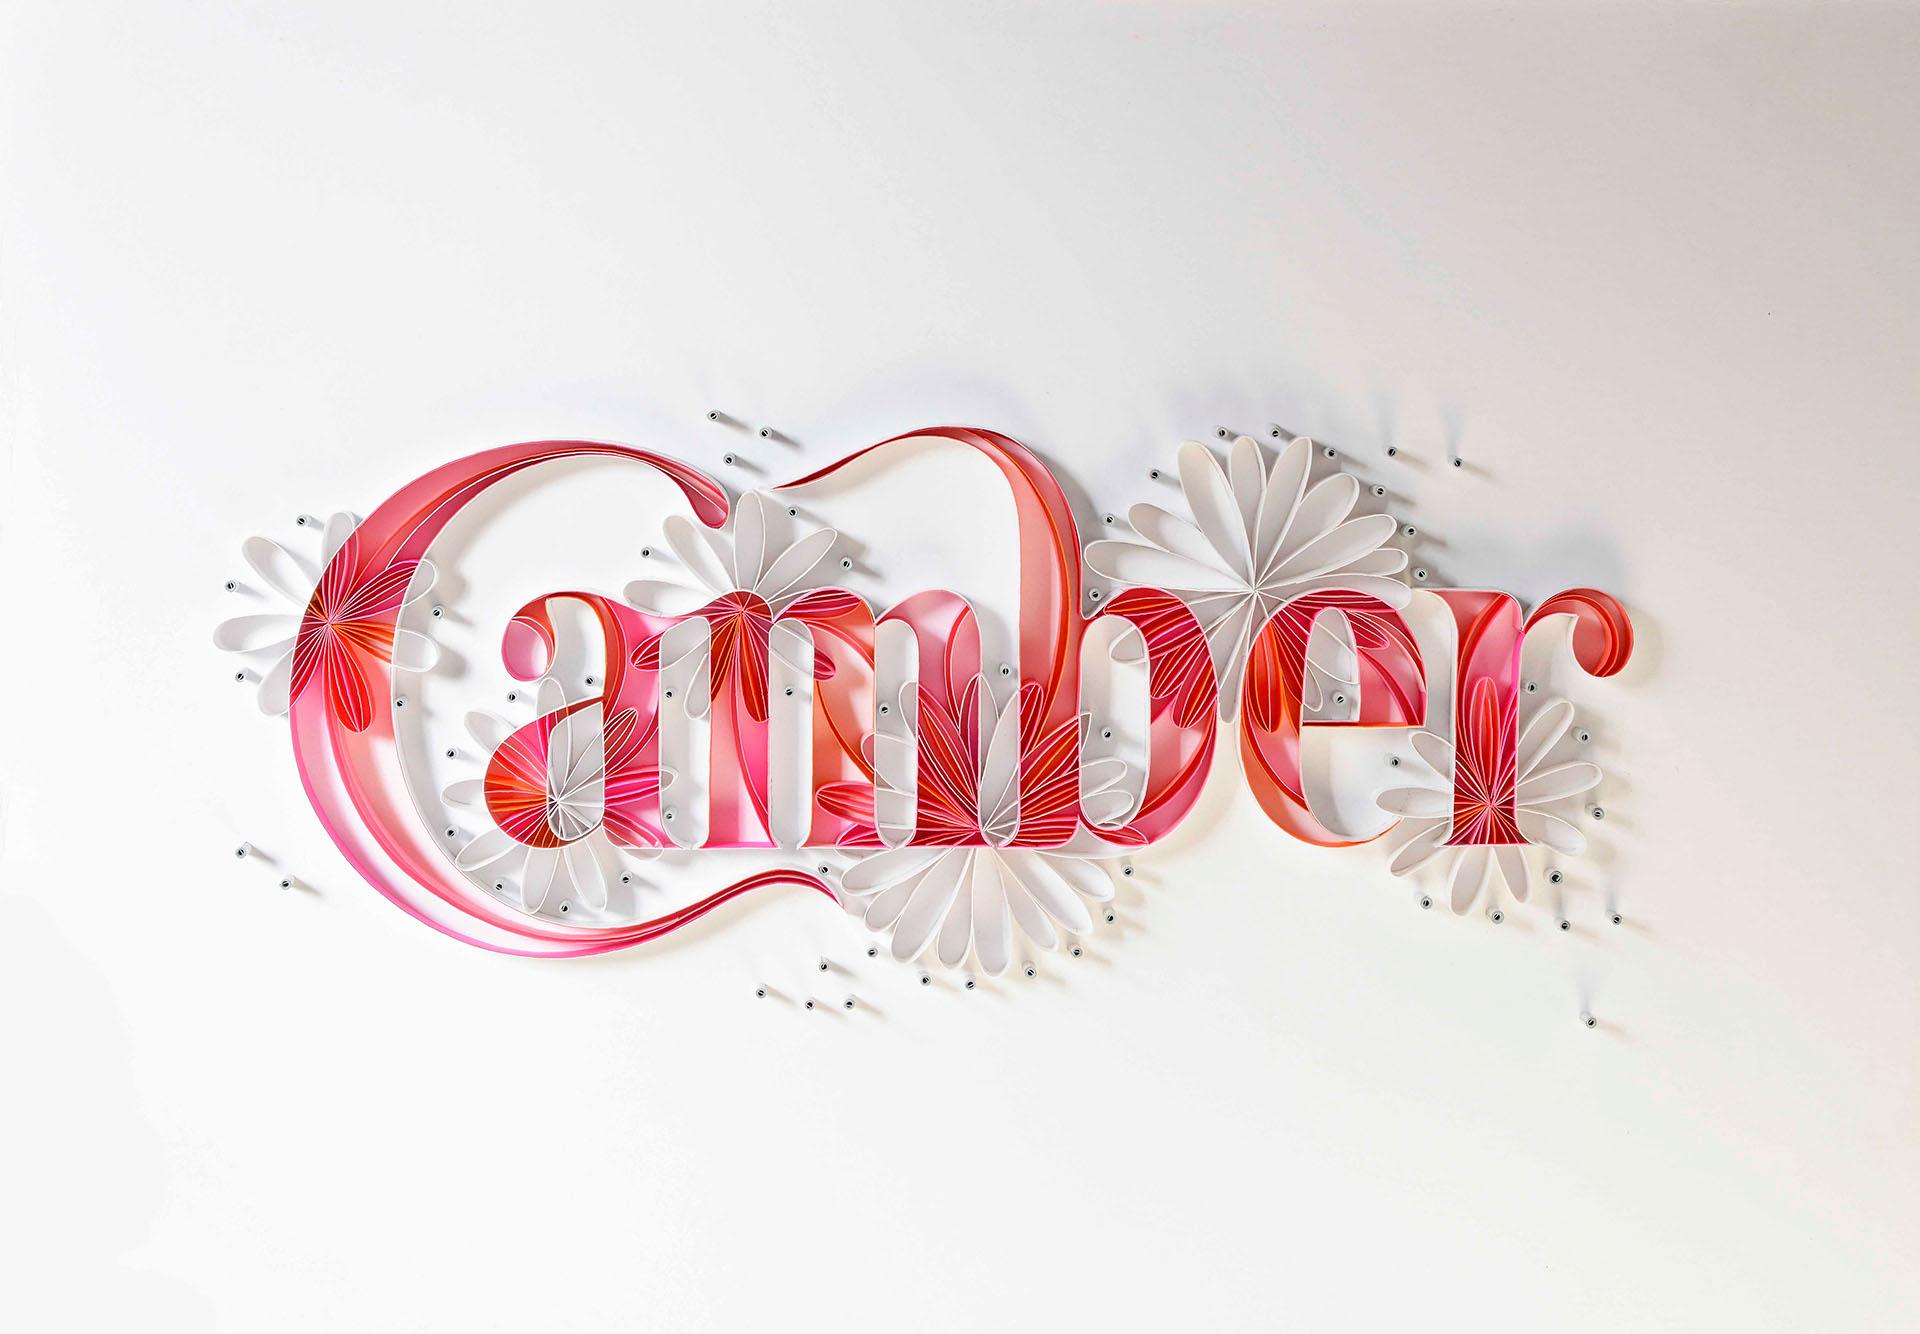 Sabeena Karnik Quilled Paper Art